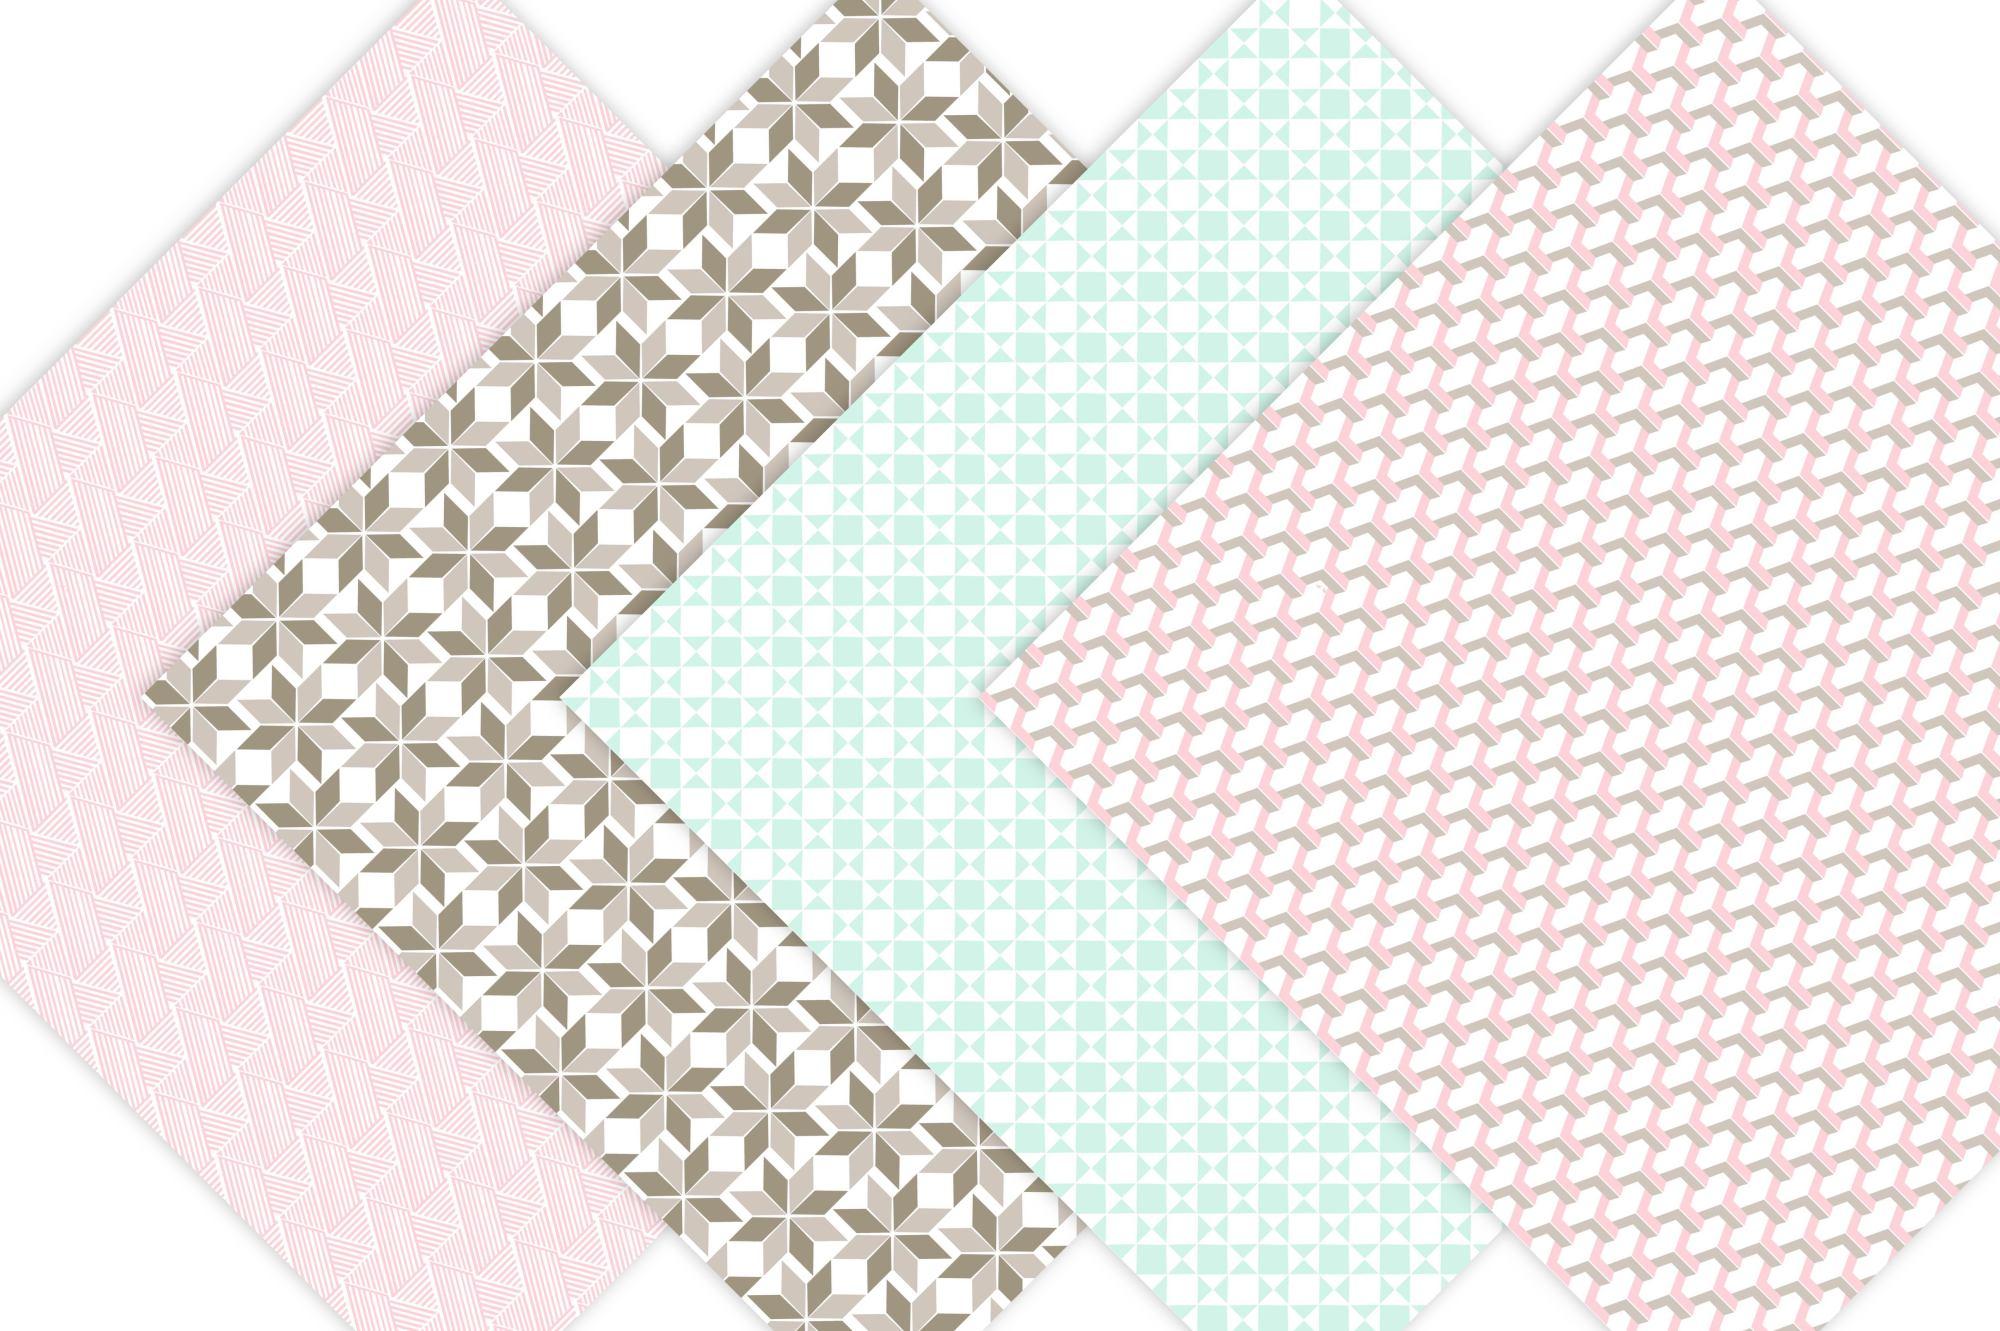 Geometric Digital Paper Patterns example image 3